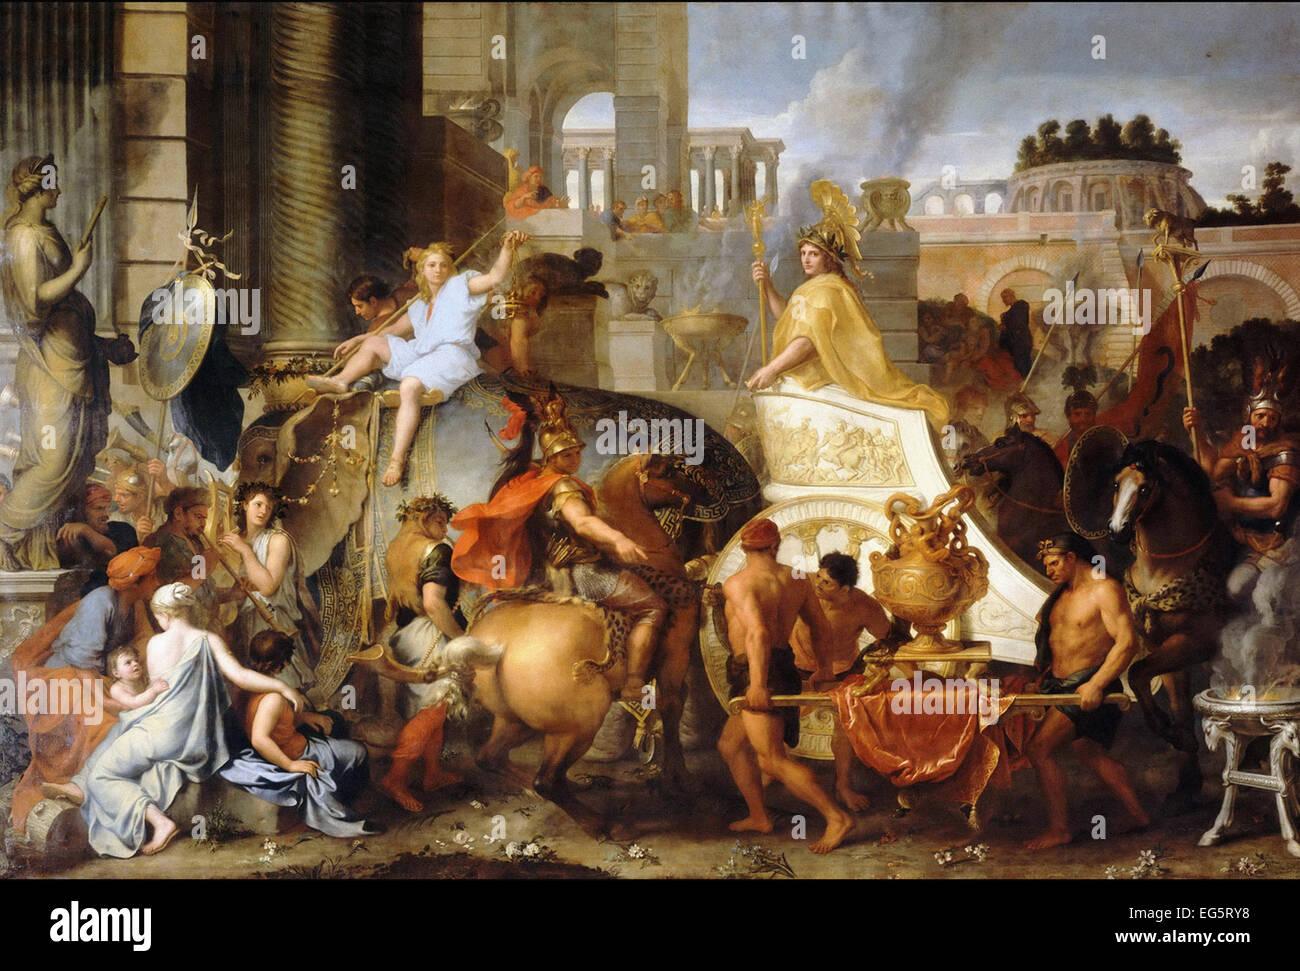 Charles Le Brun  Alexander Entering Babylon, or Triumph of Alexander - Stock Image